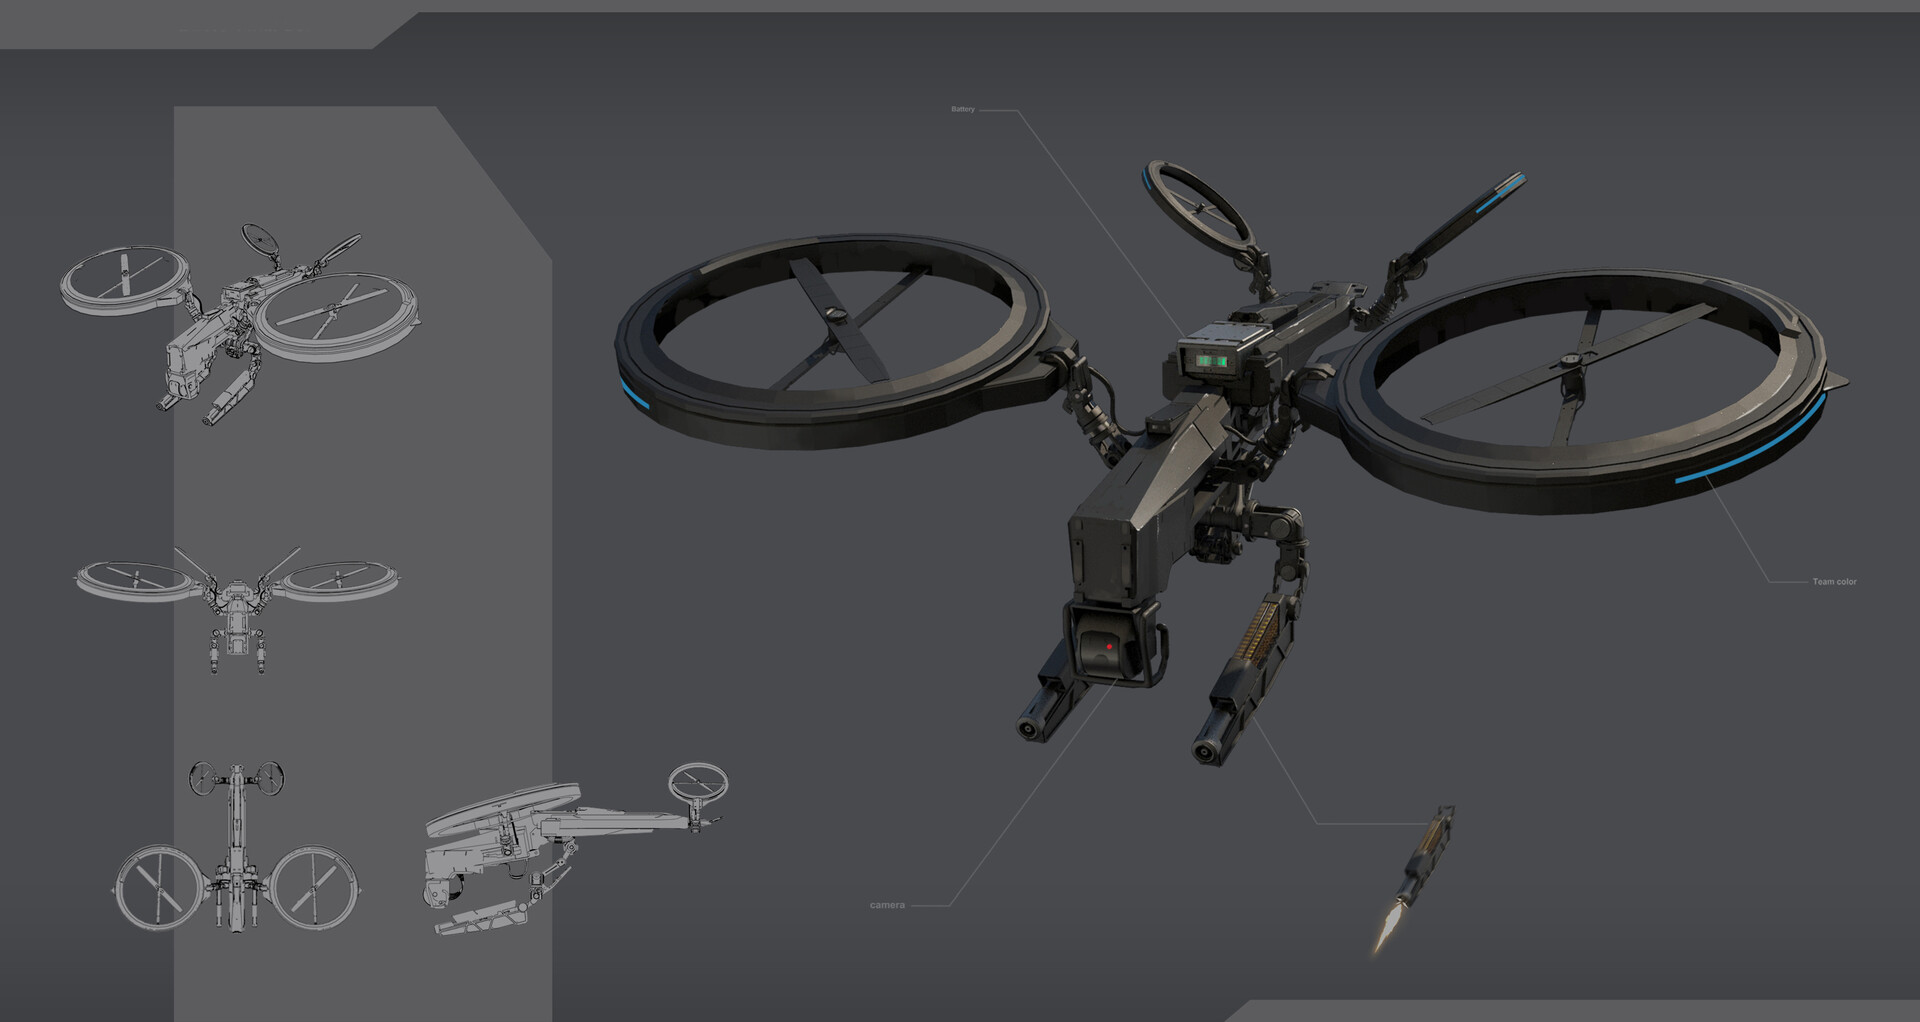 bill-yi-drones-final-basic.jpg?155542647